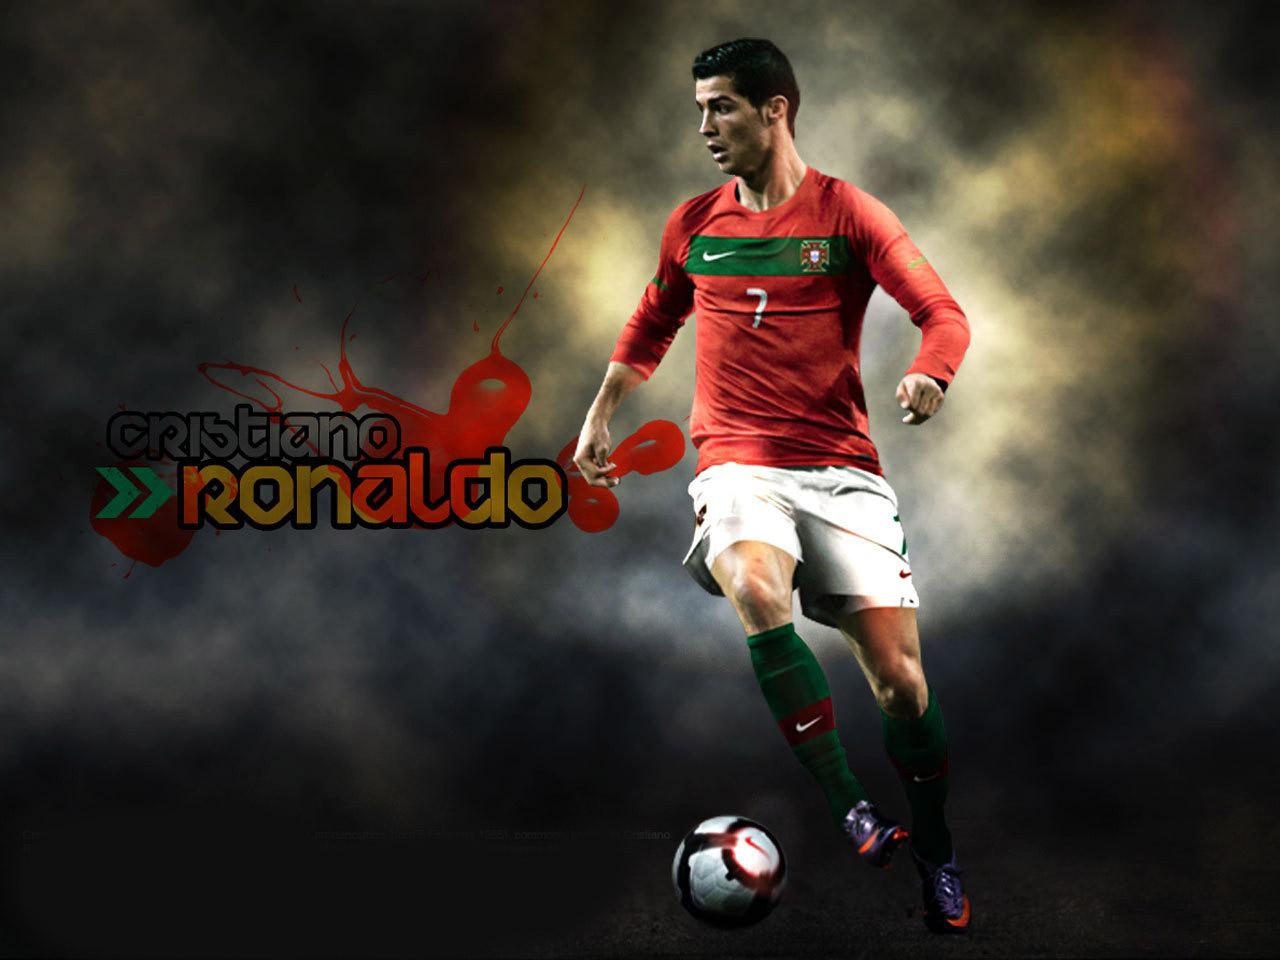 soccer wallpaper ronaldo - photo #30